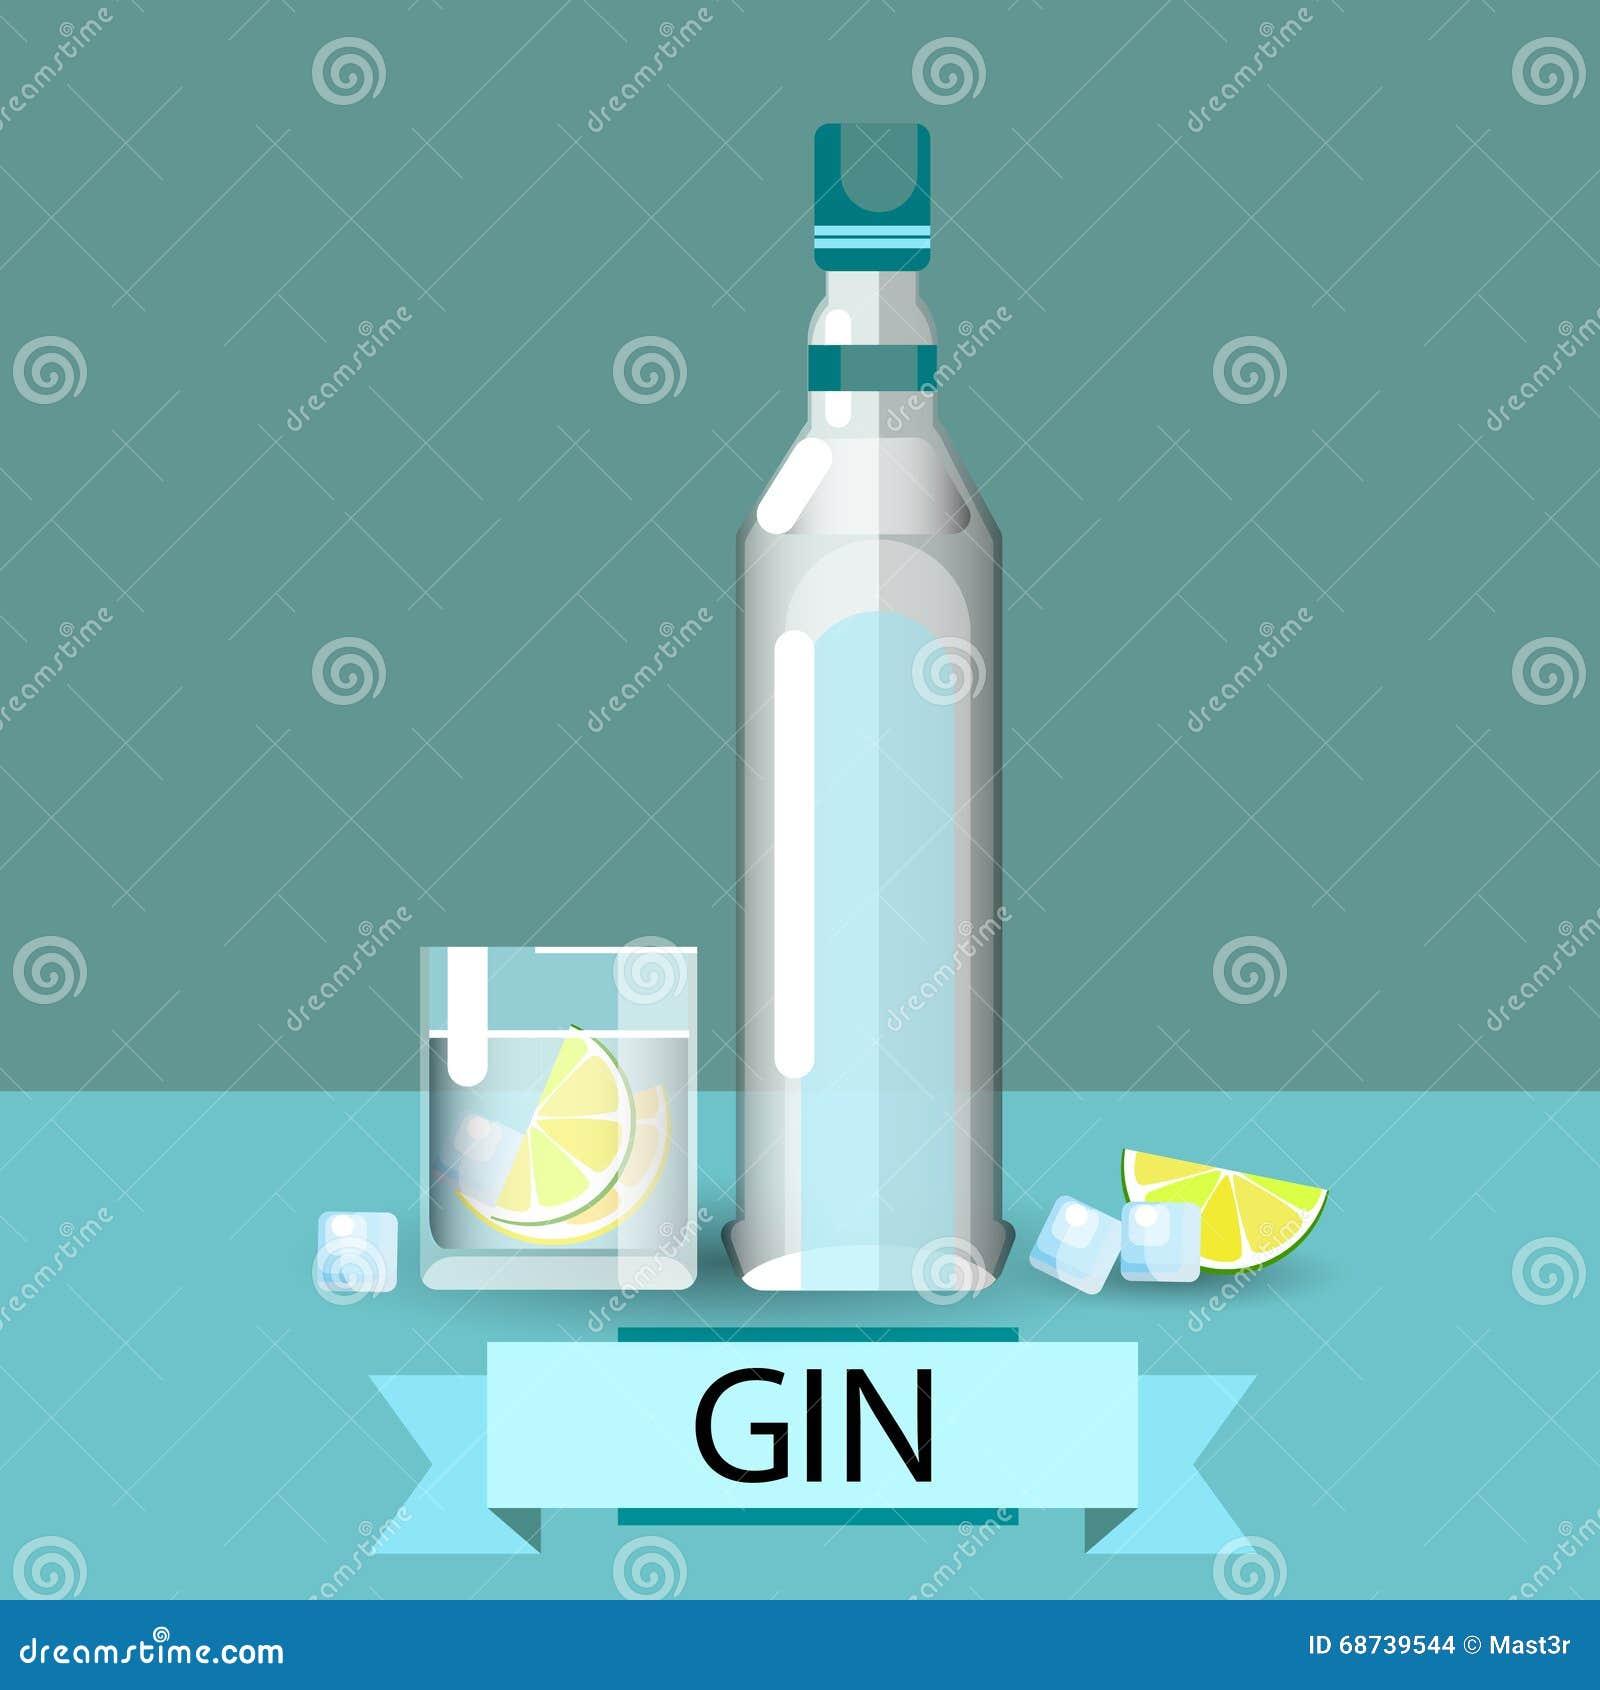 Gin Bottle Glass Lemon Alcohol-Getränk-Ikone flach